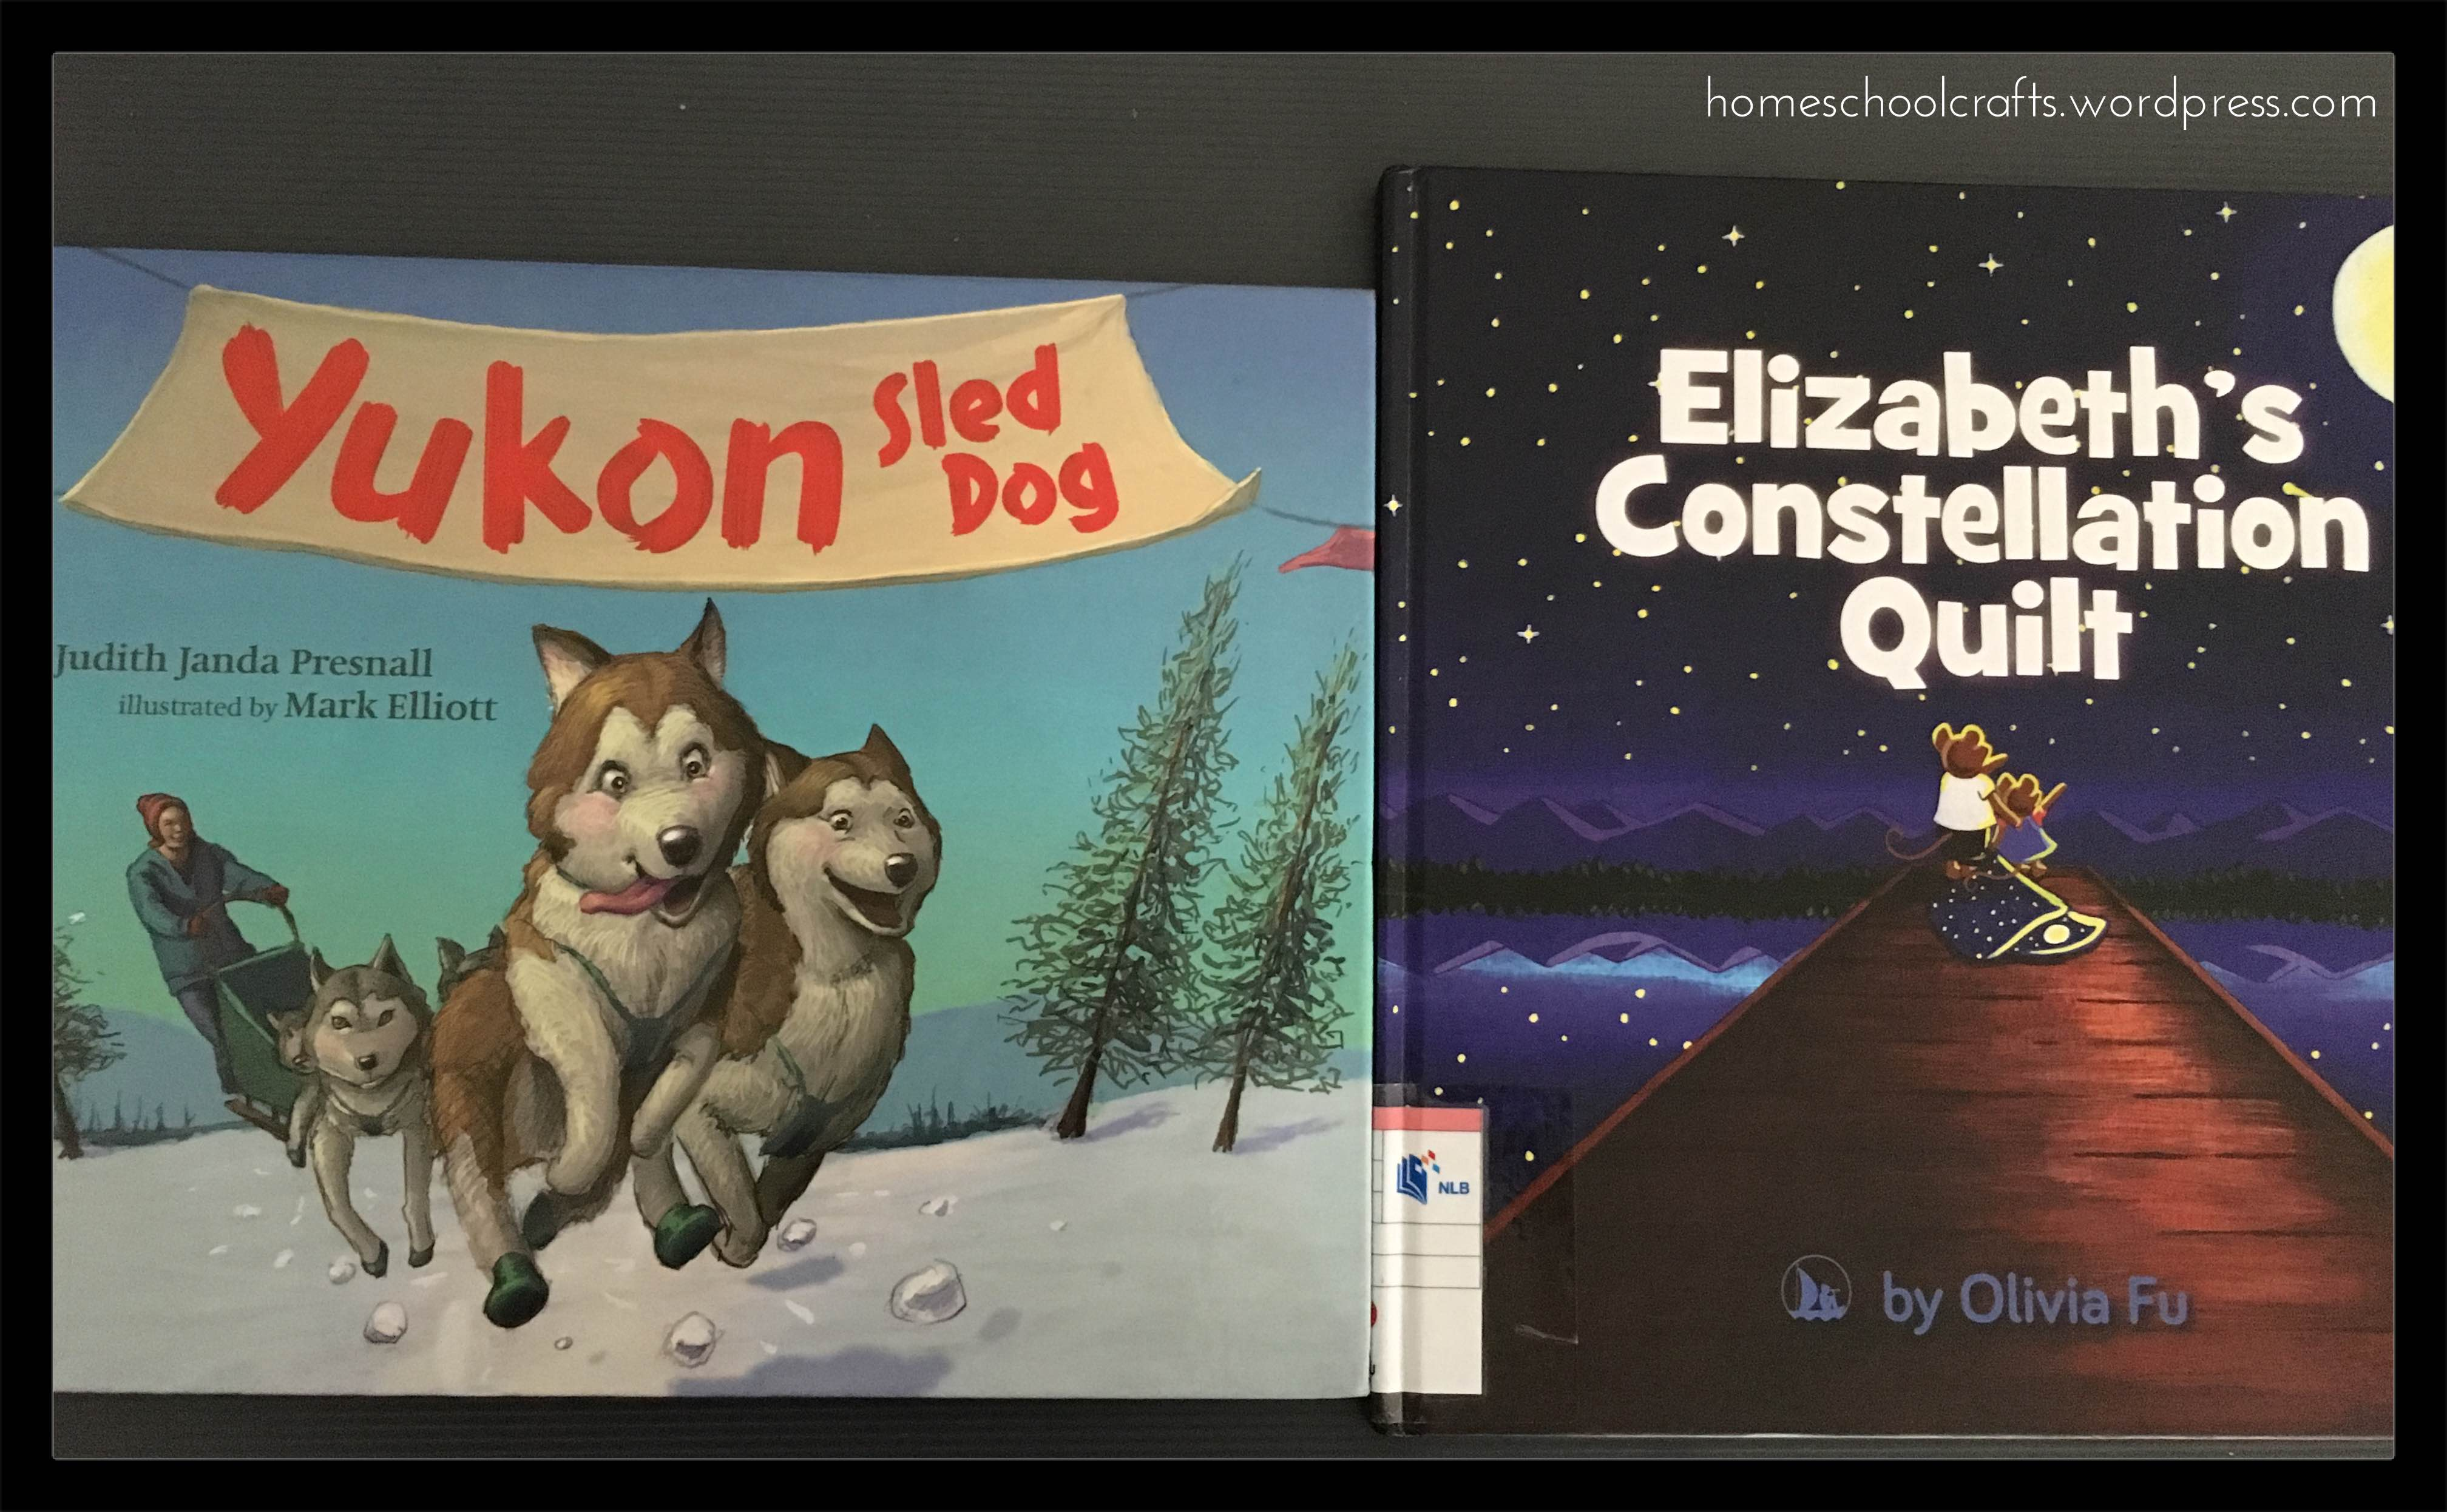 Book-Review-Yukon-Sled-Dog-Elizabeth-Constellation-Quilt-Homeschool-Crafts.jpg